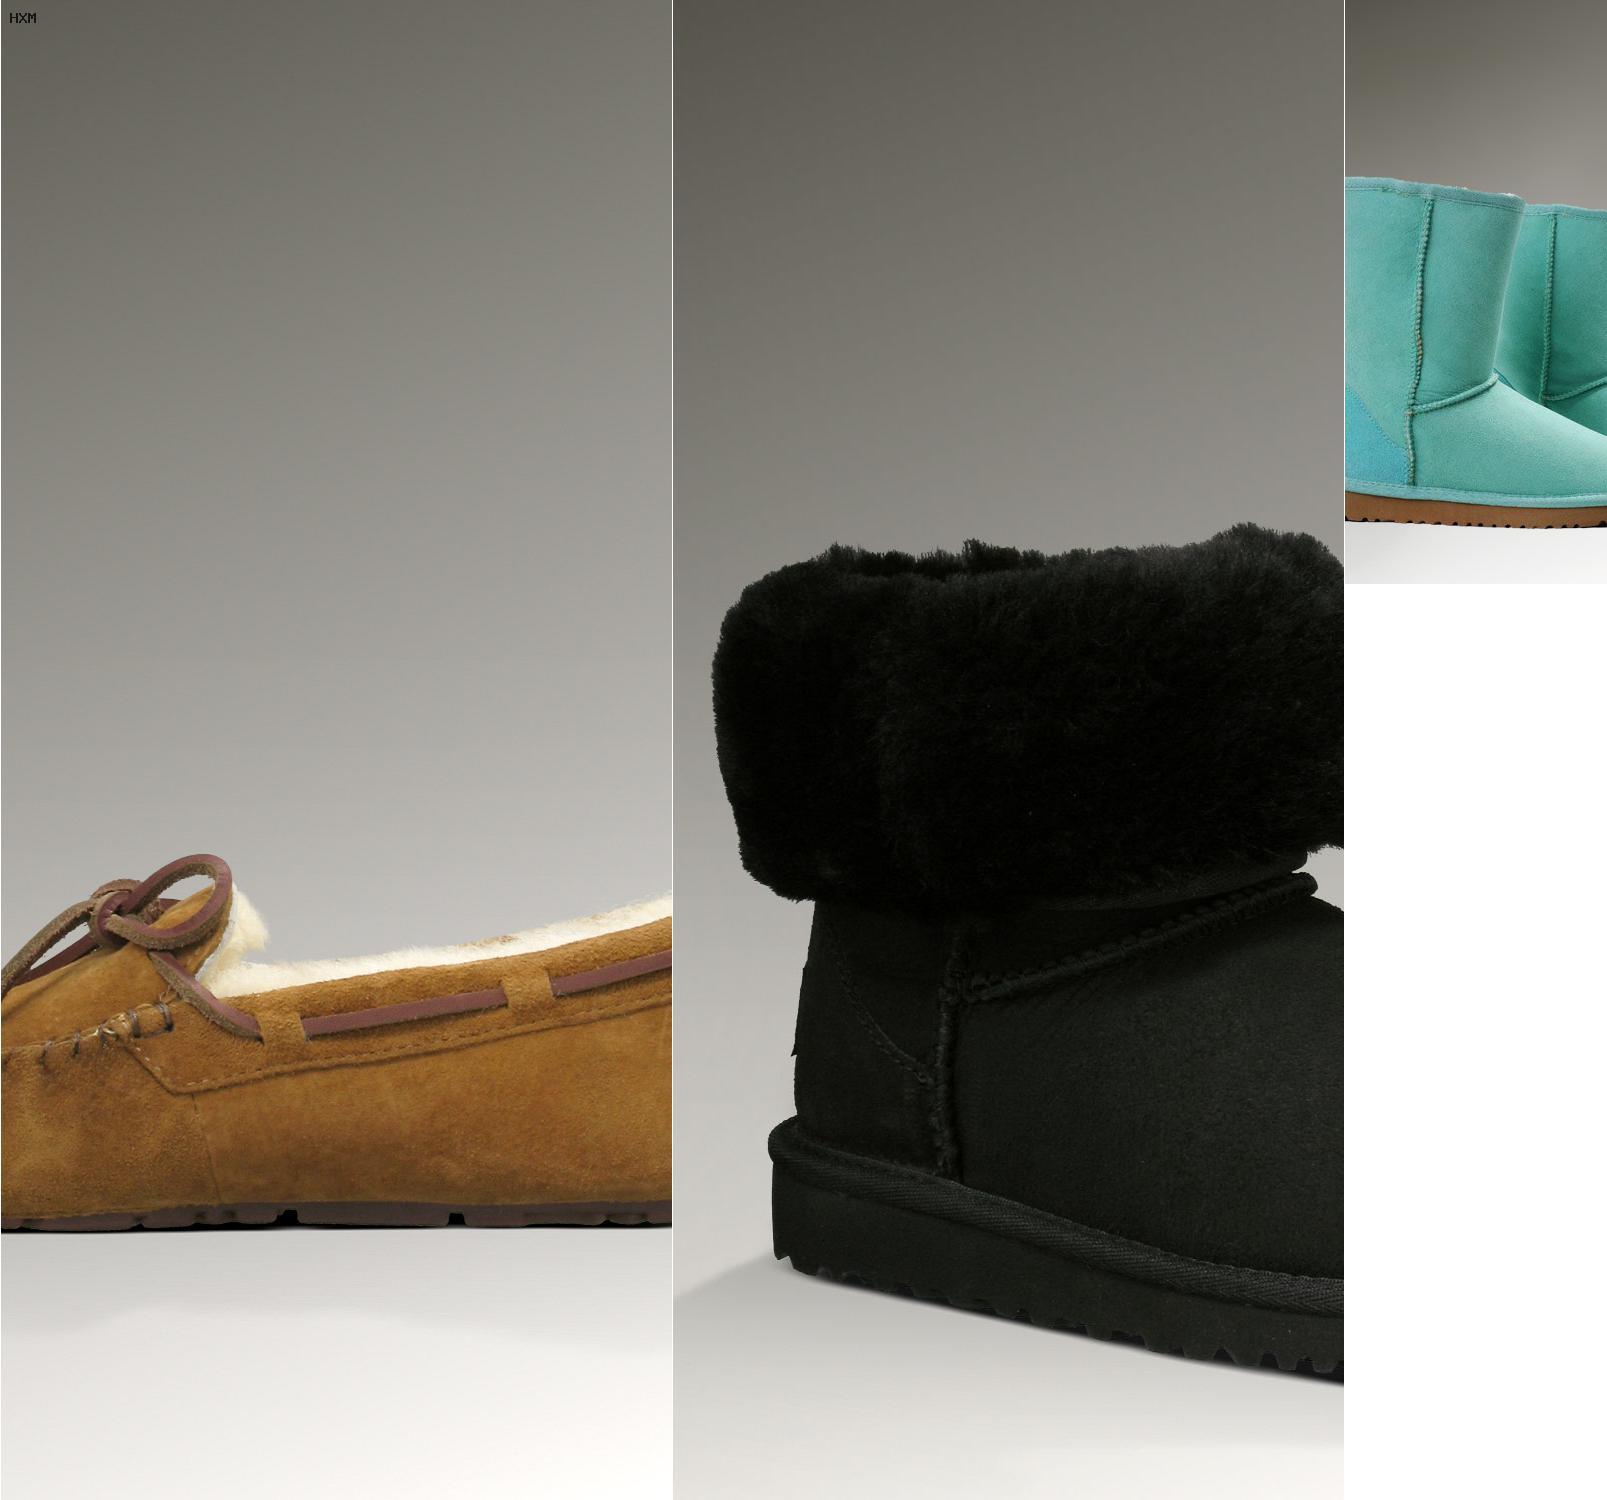 botas ugg y similares